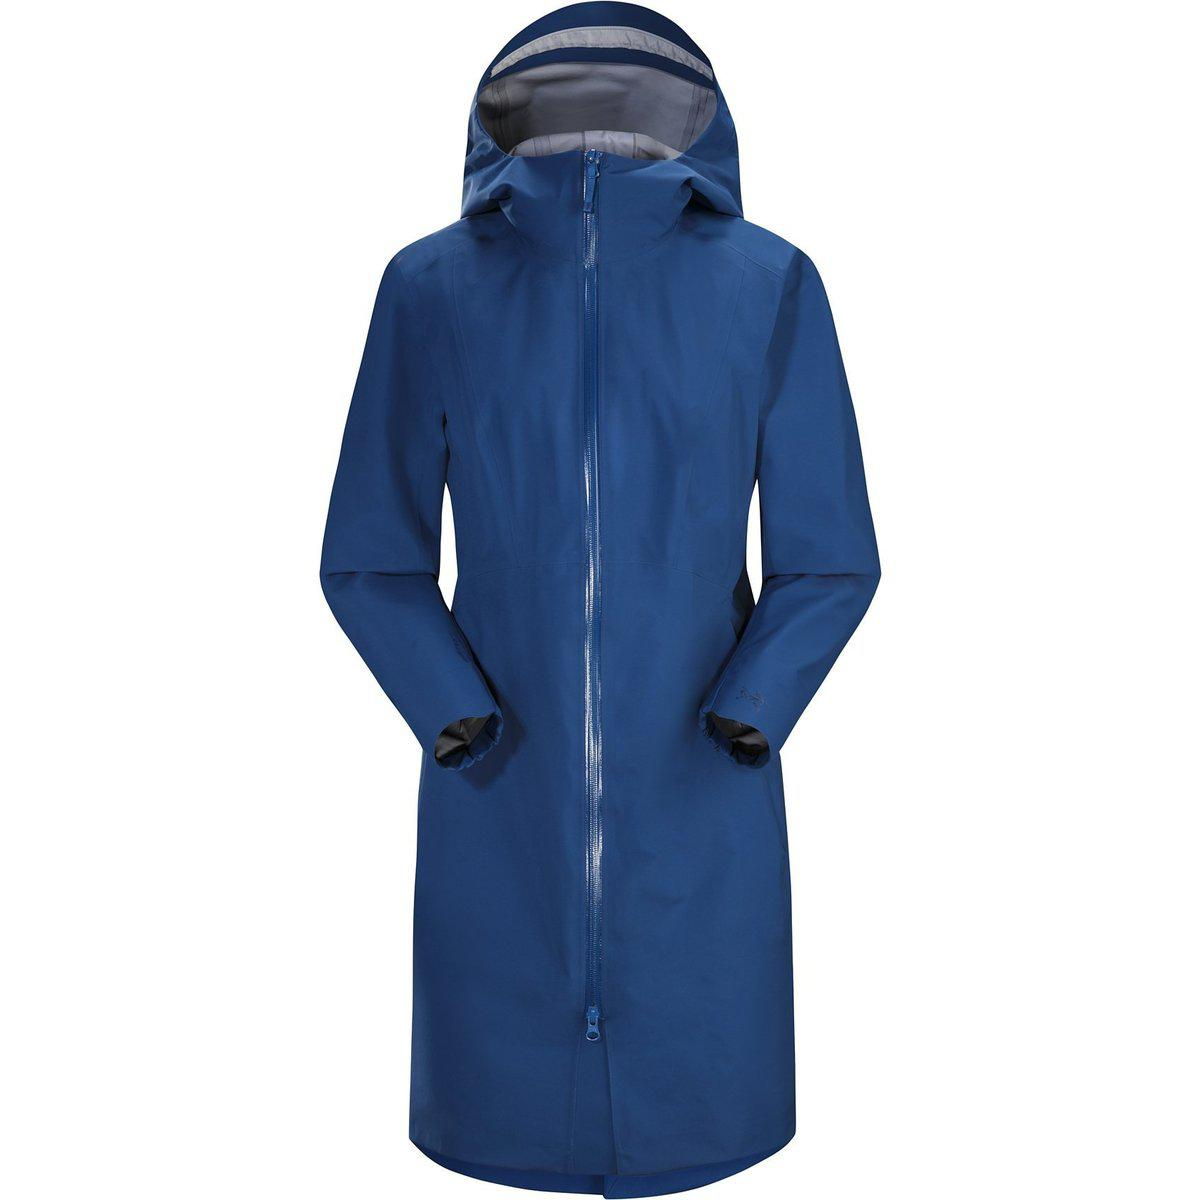 Jackets | Winter, Rain, & Running Paragon Sports